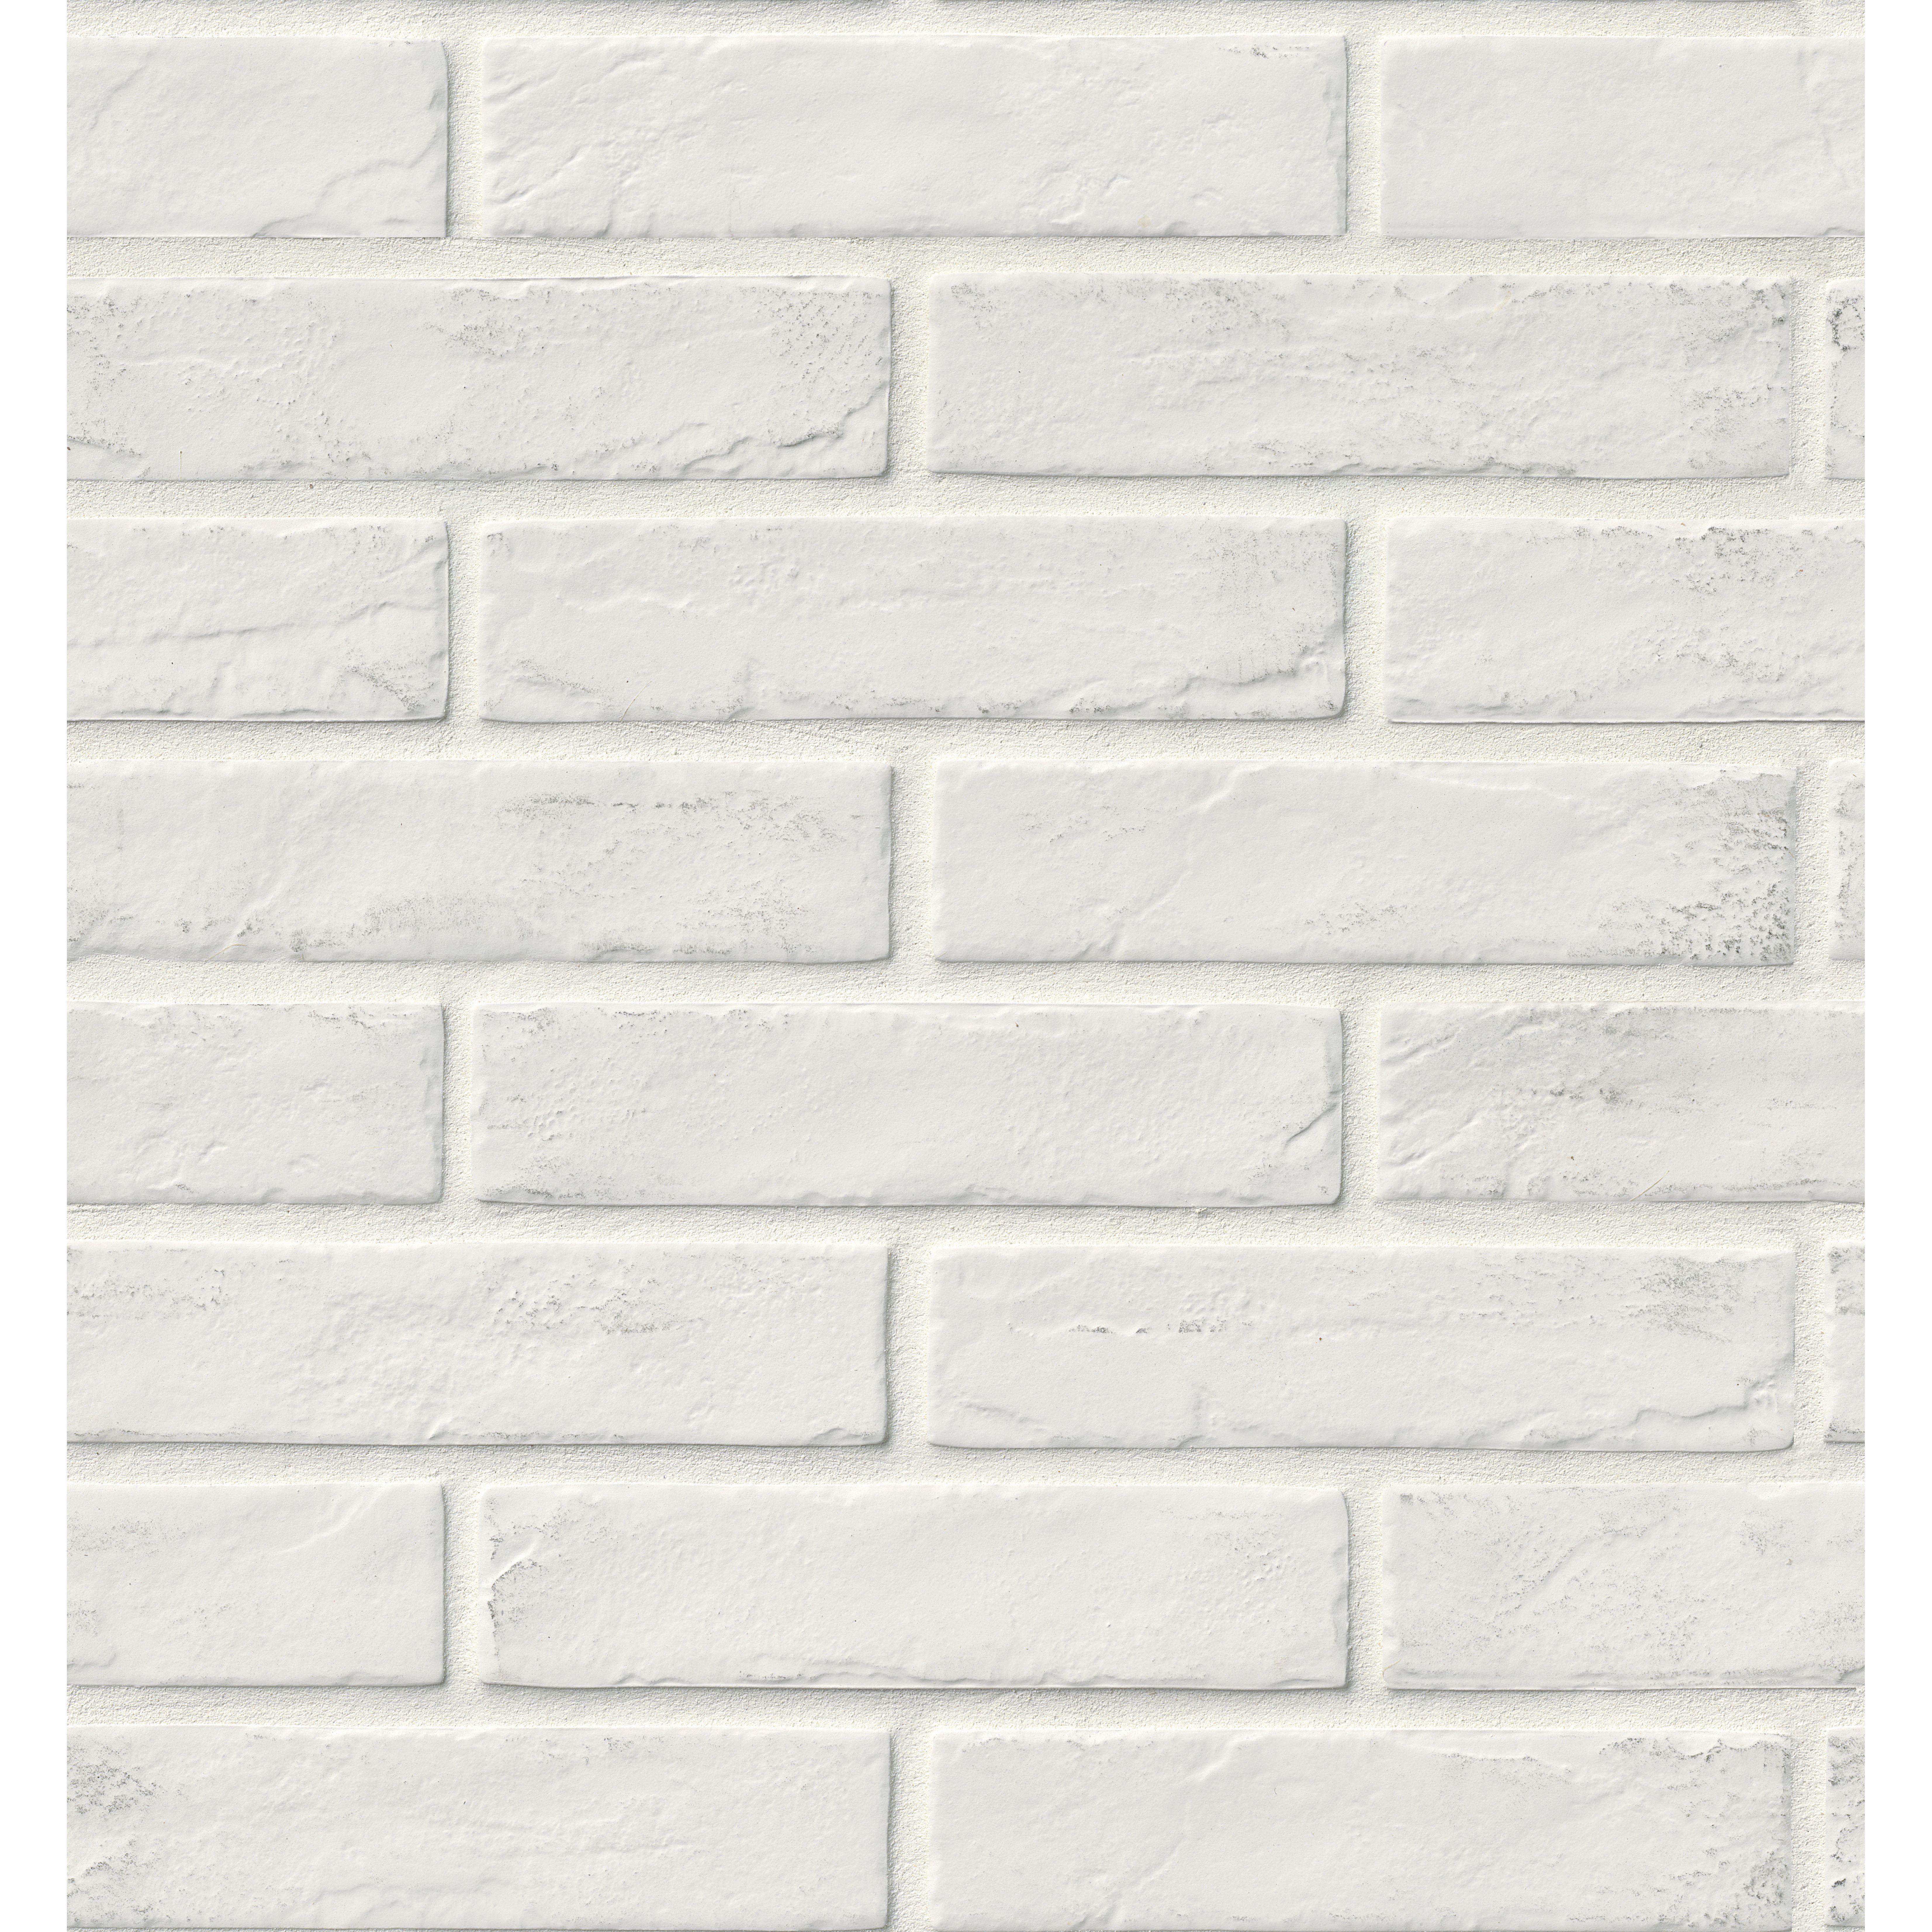 Ms international capella 233 x 10 porcelain subway tile in ms international capella 233 x 10 porcelain subway tile in white brick dailygadgetfo Choice Image